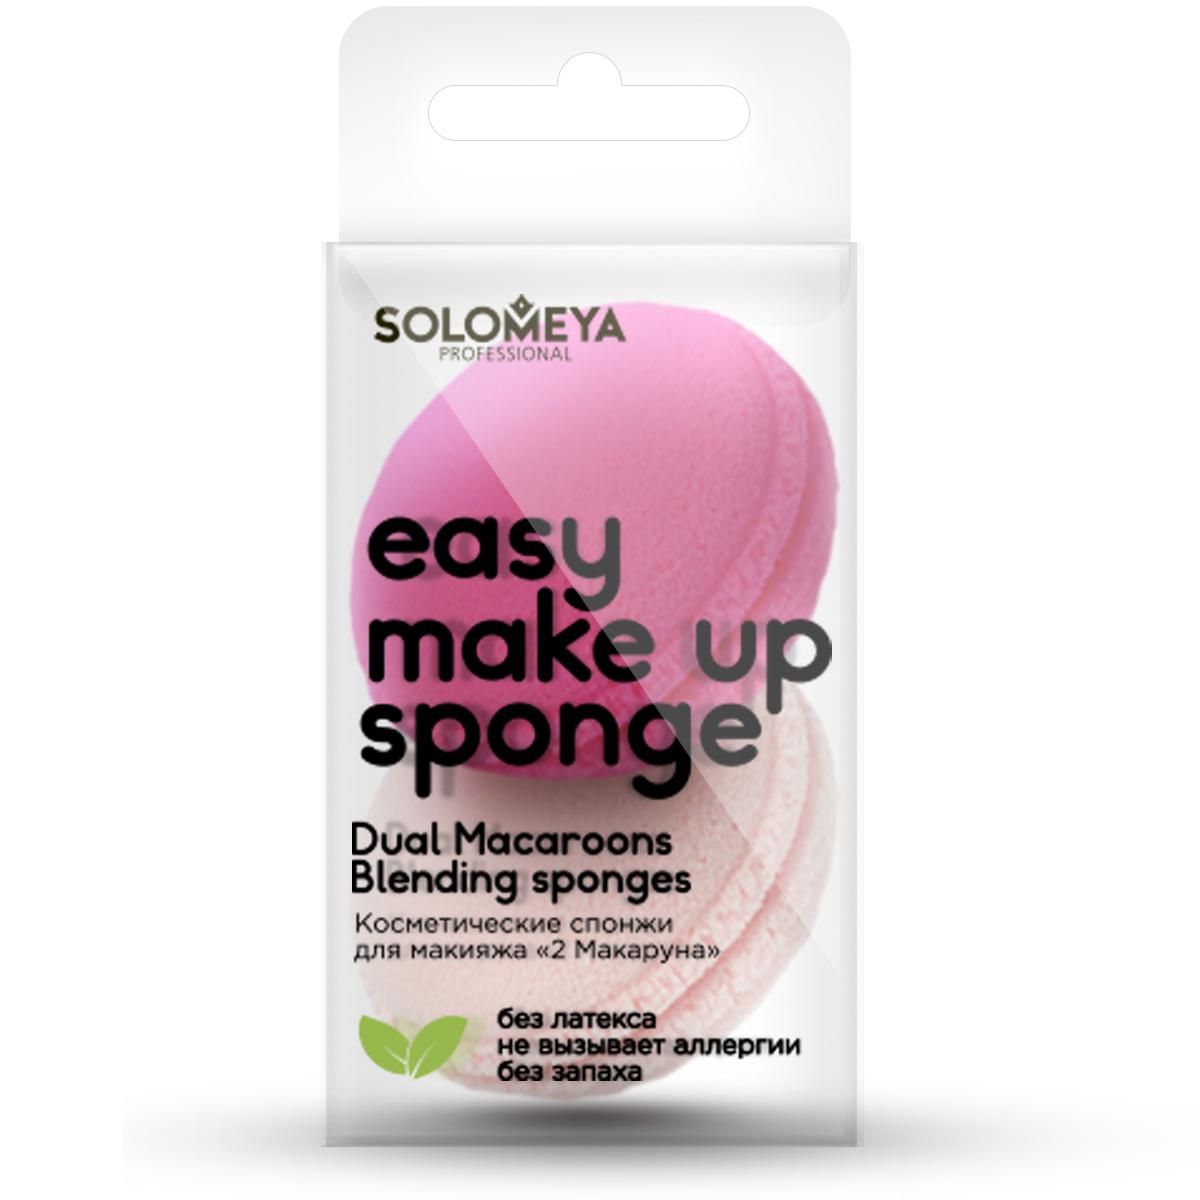 SOLOMEYA Спонжи косметические для макияжа 2 Макаруна / Dual Macaroons Blending sponges 2 шт/уп -  Спонжи